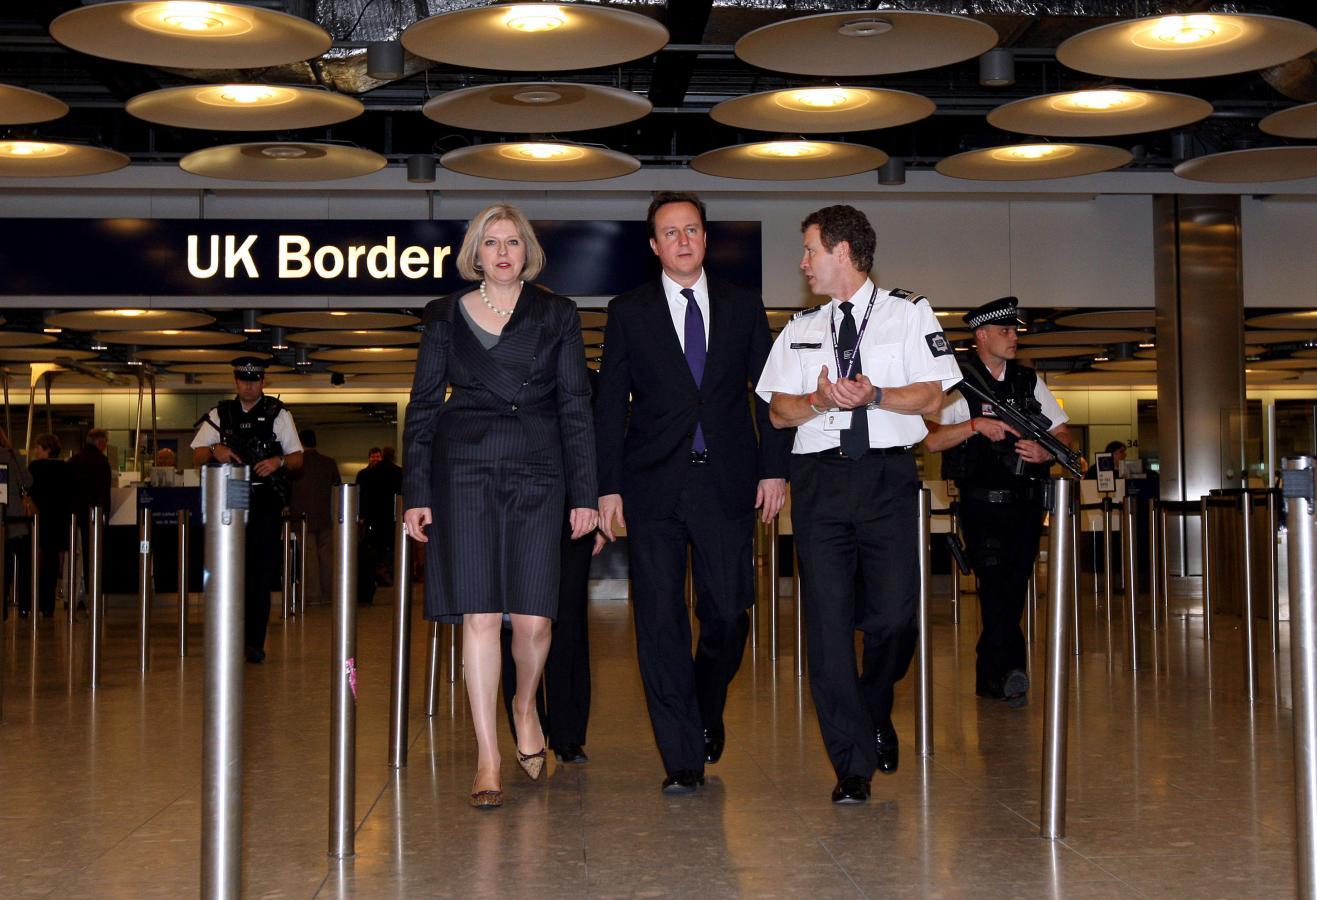 uk-border-cameron.jpg